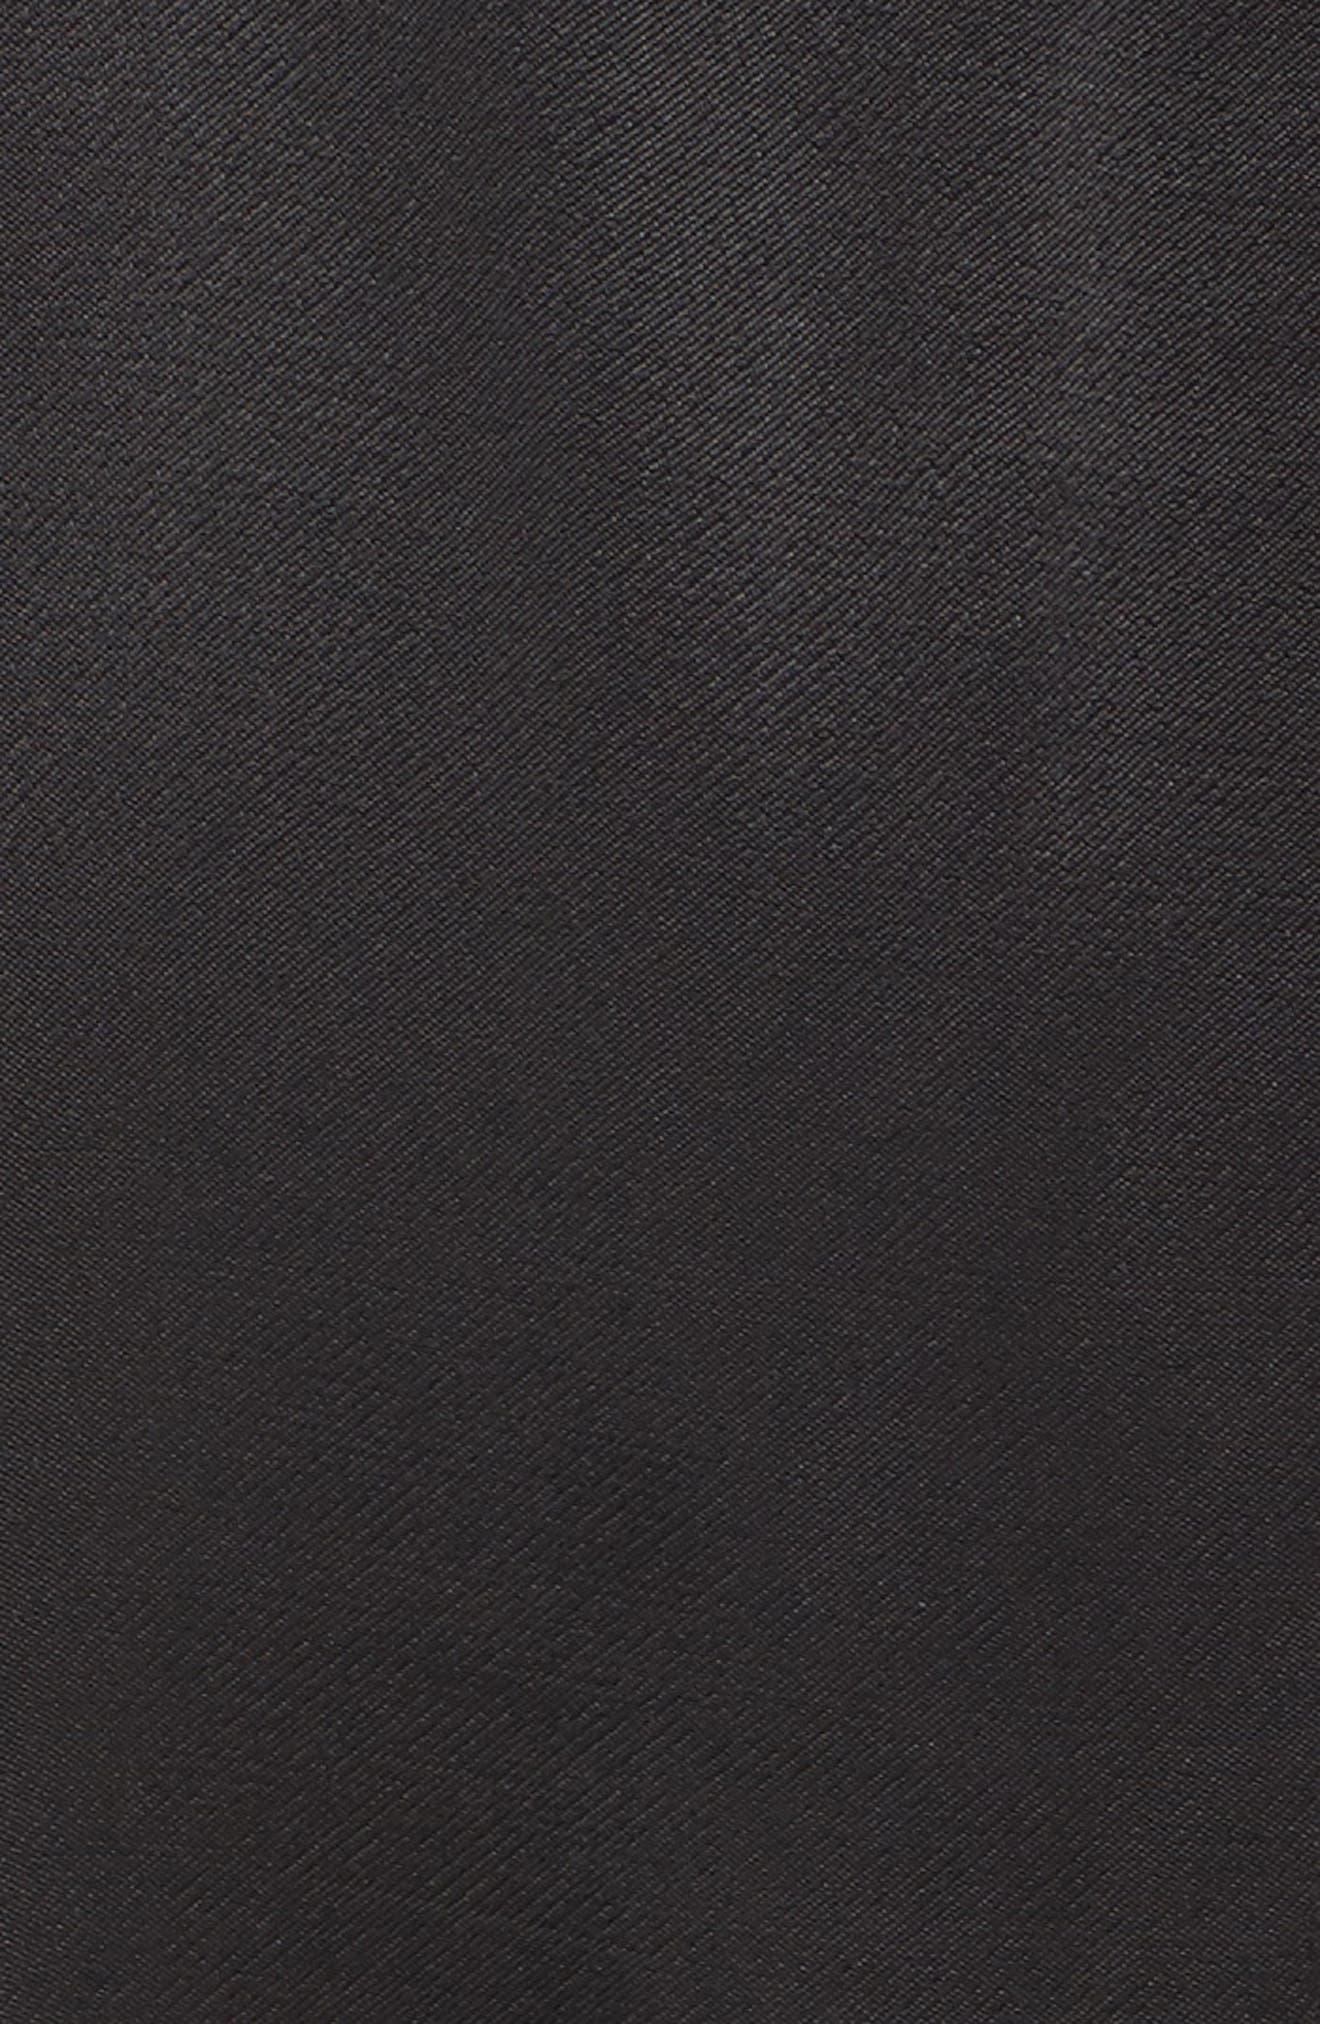 Cassia Ruffle Trim Shirtdress,                             Alternate thumbnail 6, color,